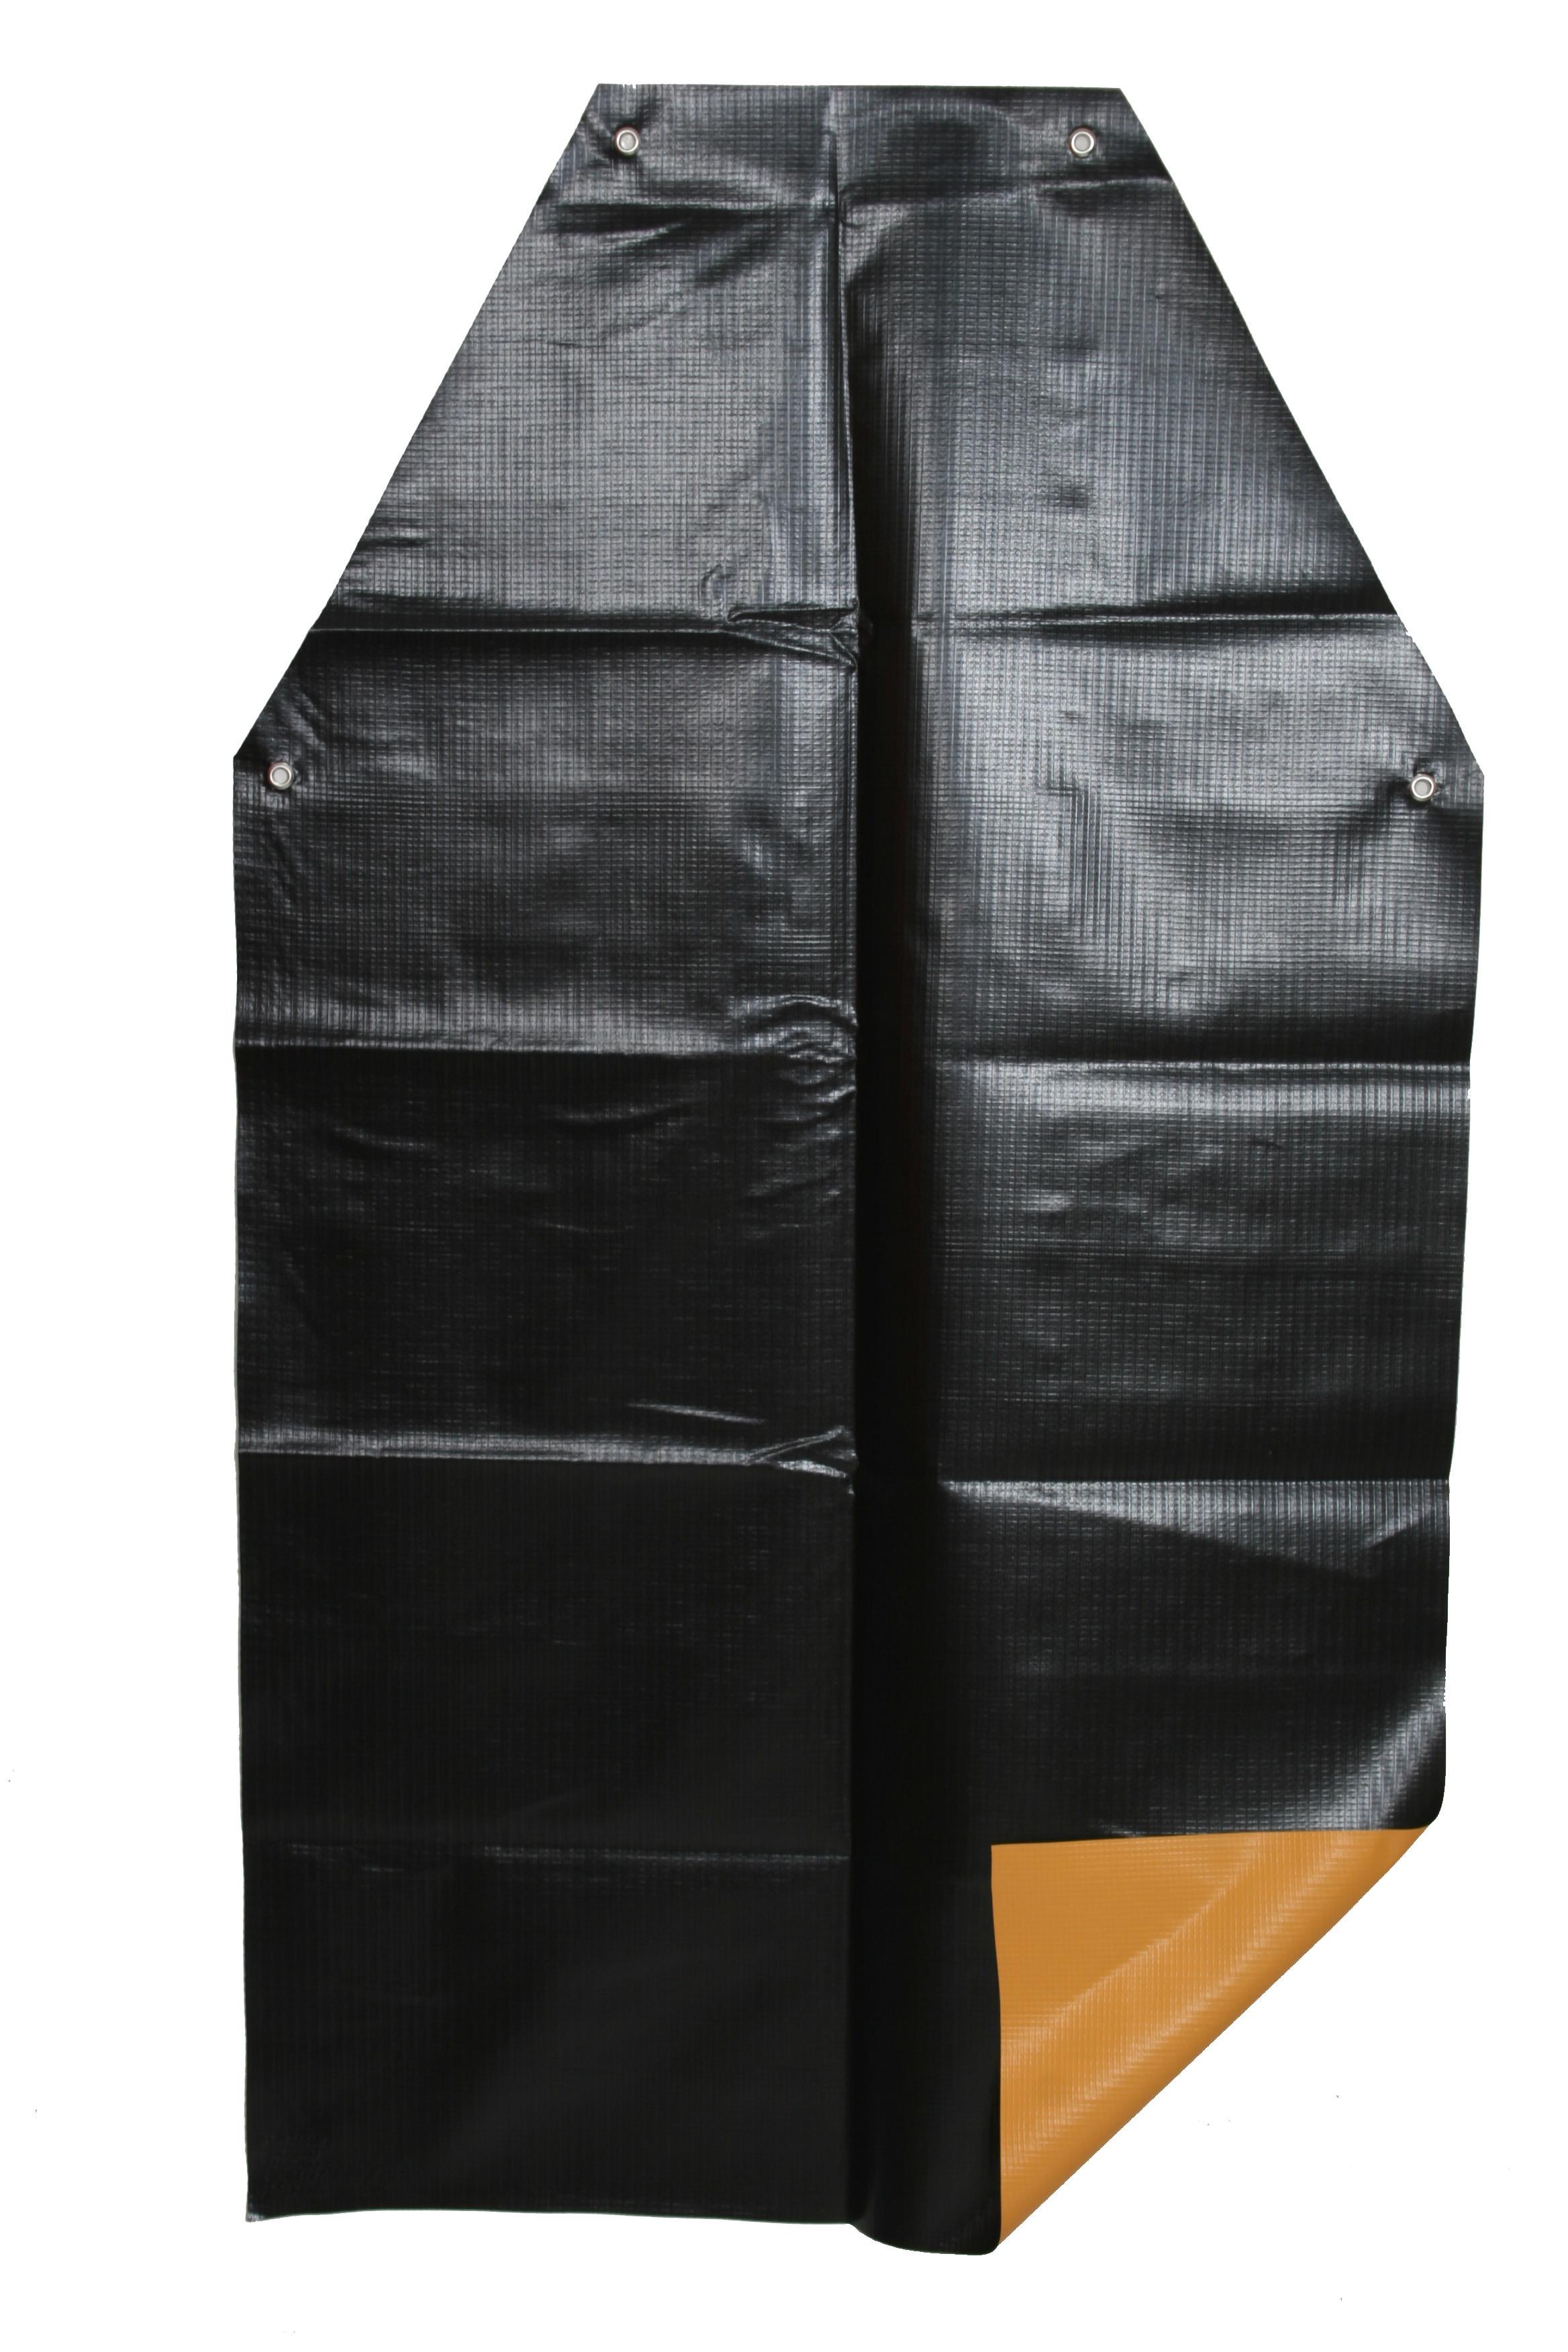 Avental Kp1000 Trevira Dupla Face 1 20 X 0 70 Com Ilh Ses